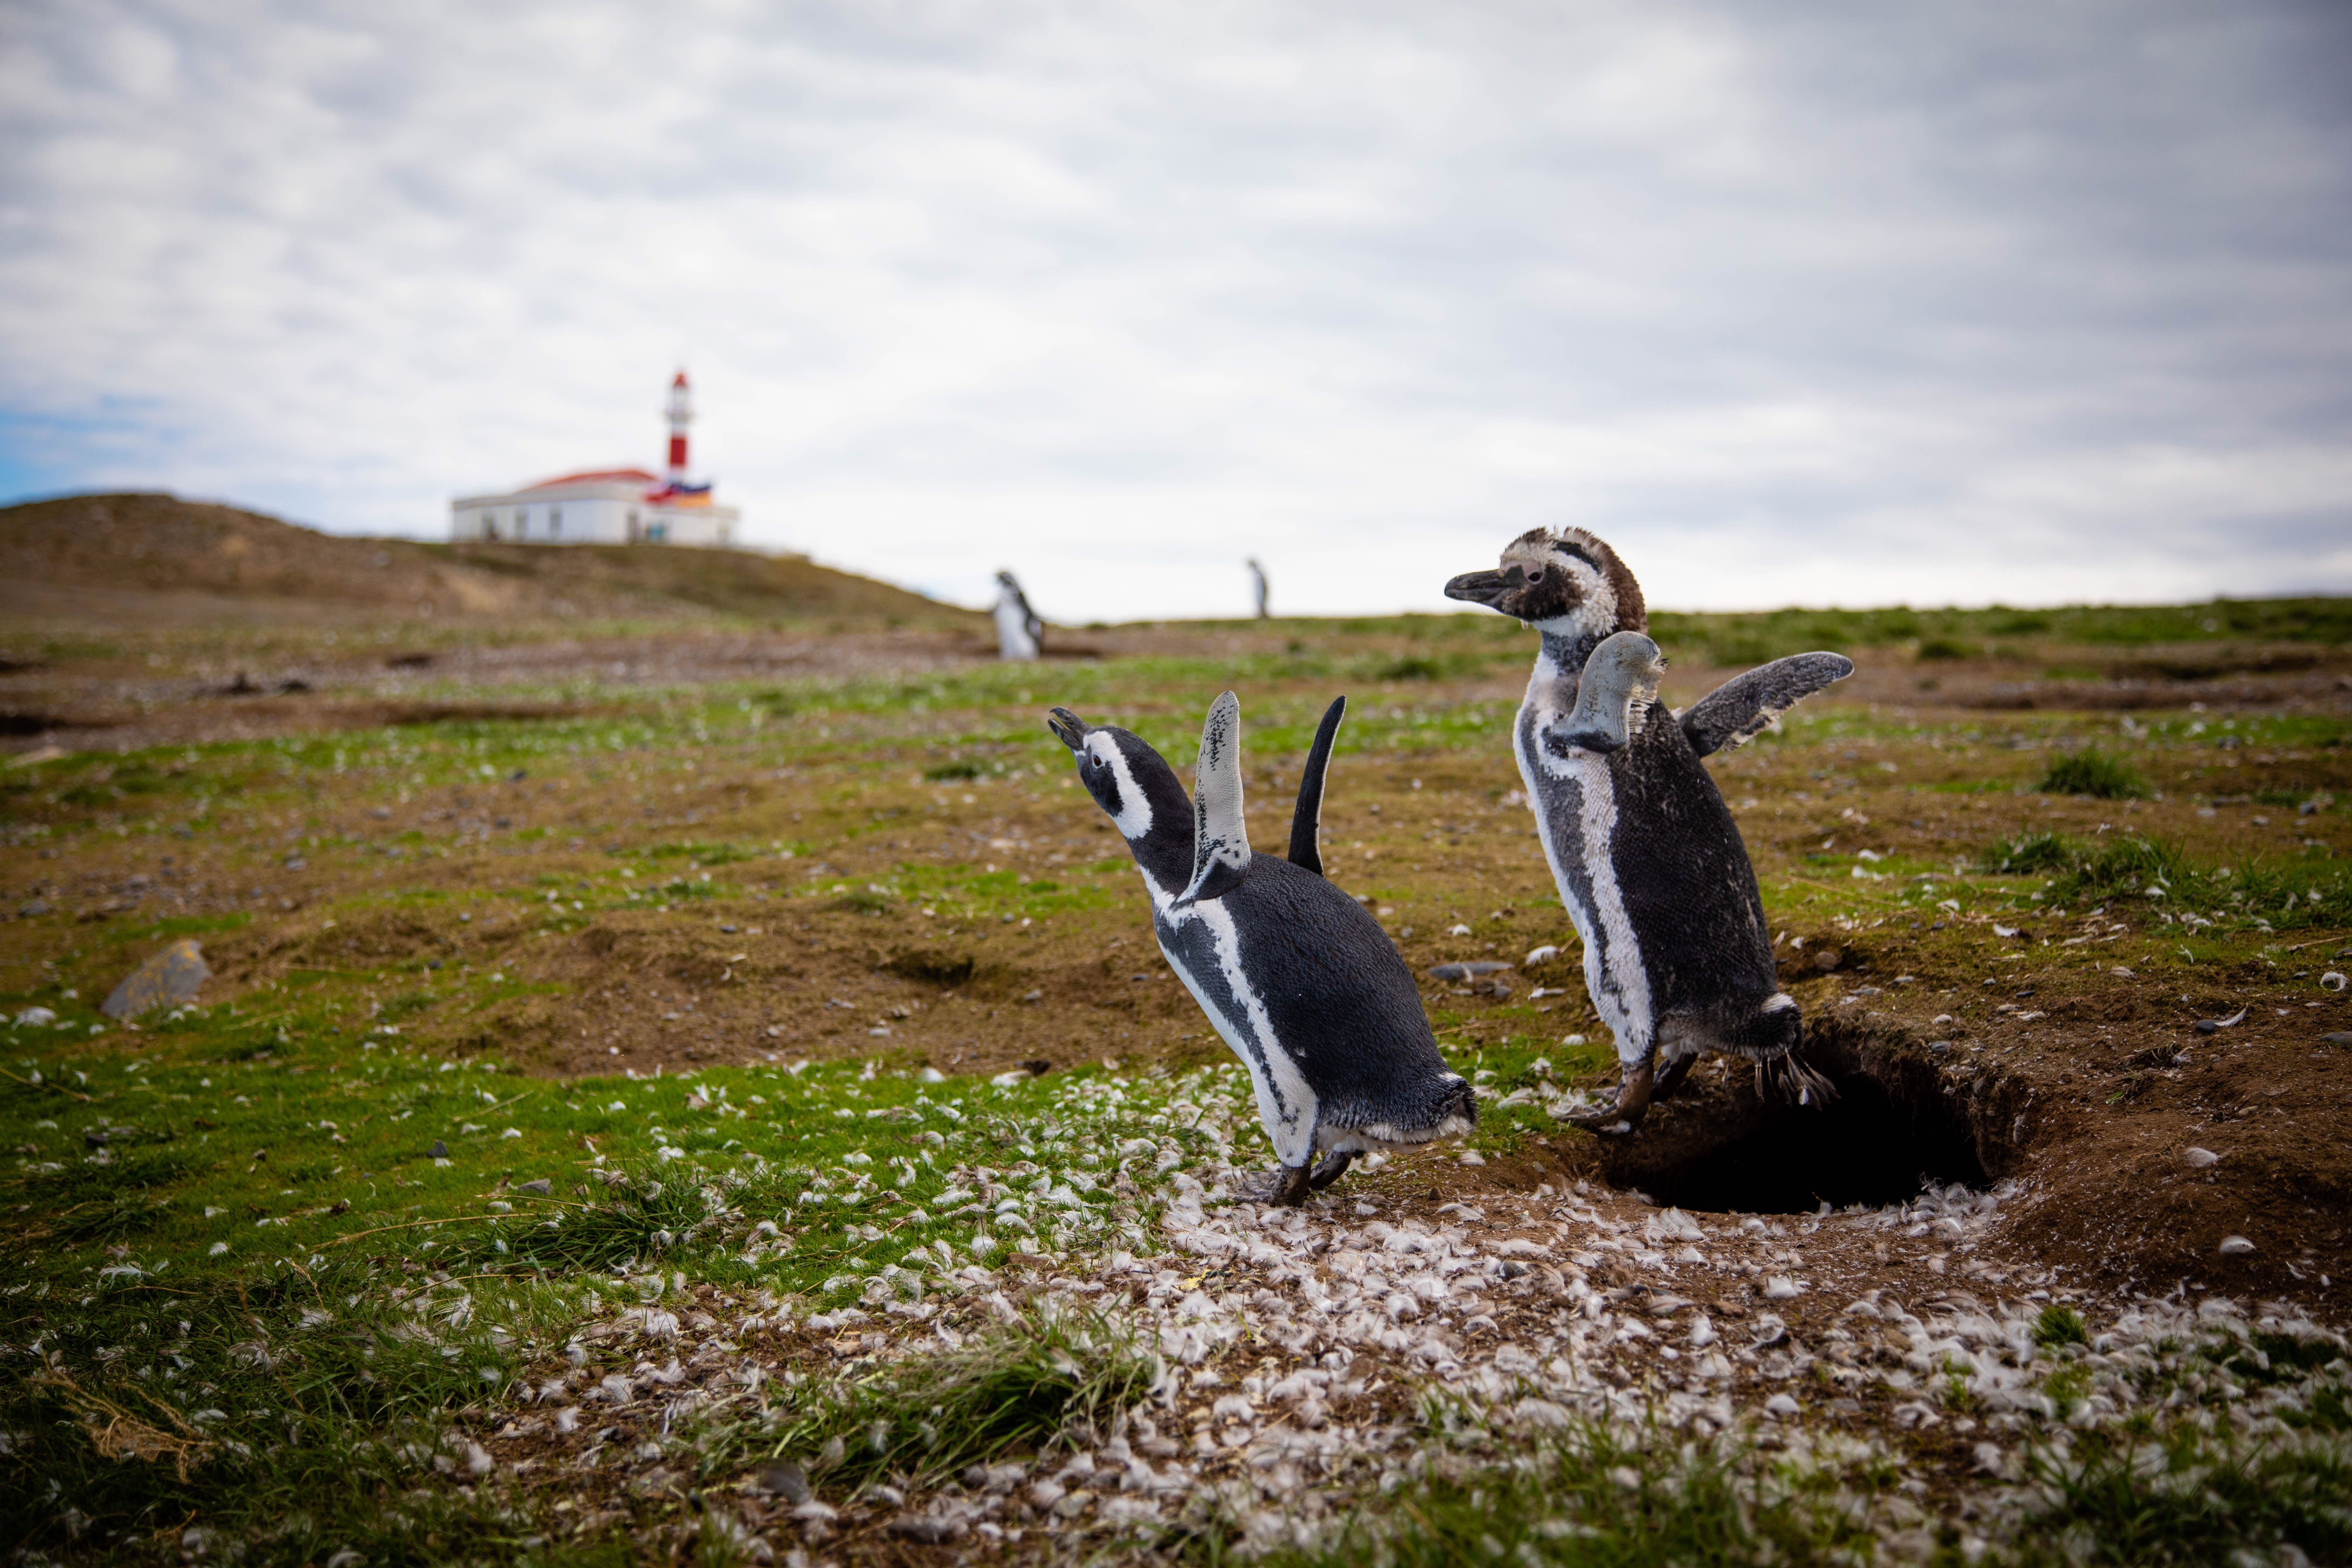 Penguins and lighthouse on Magdalena Island near Punta Arenas